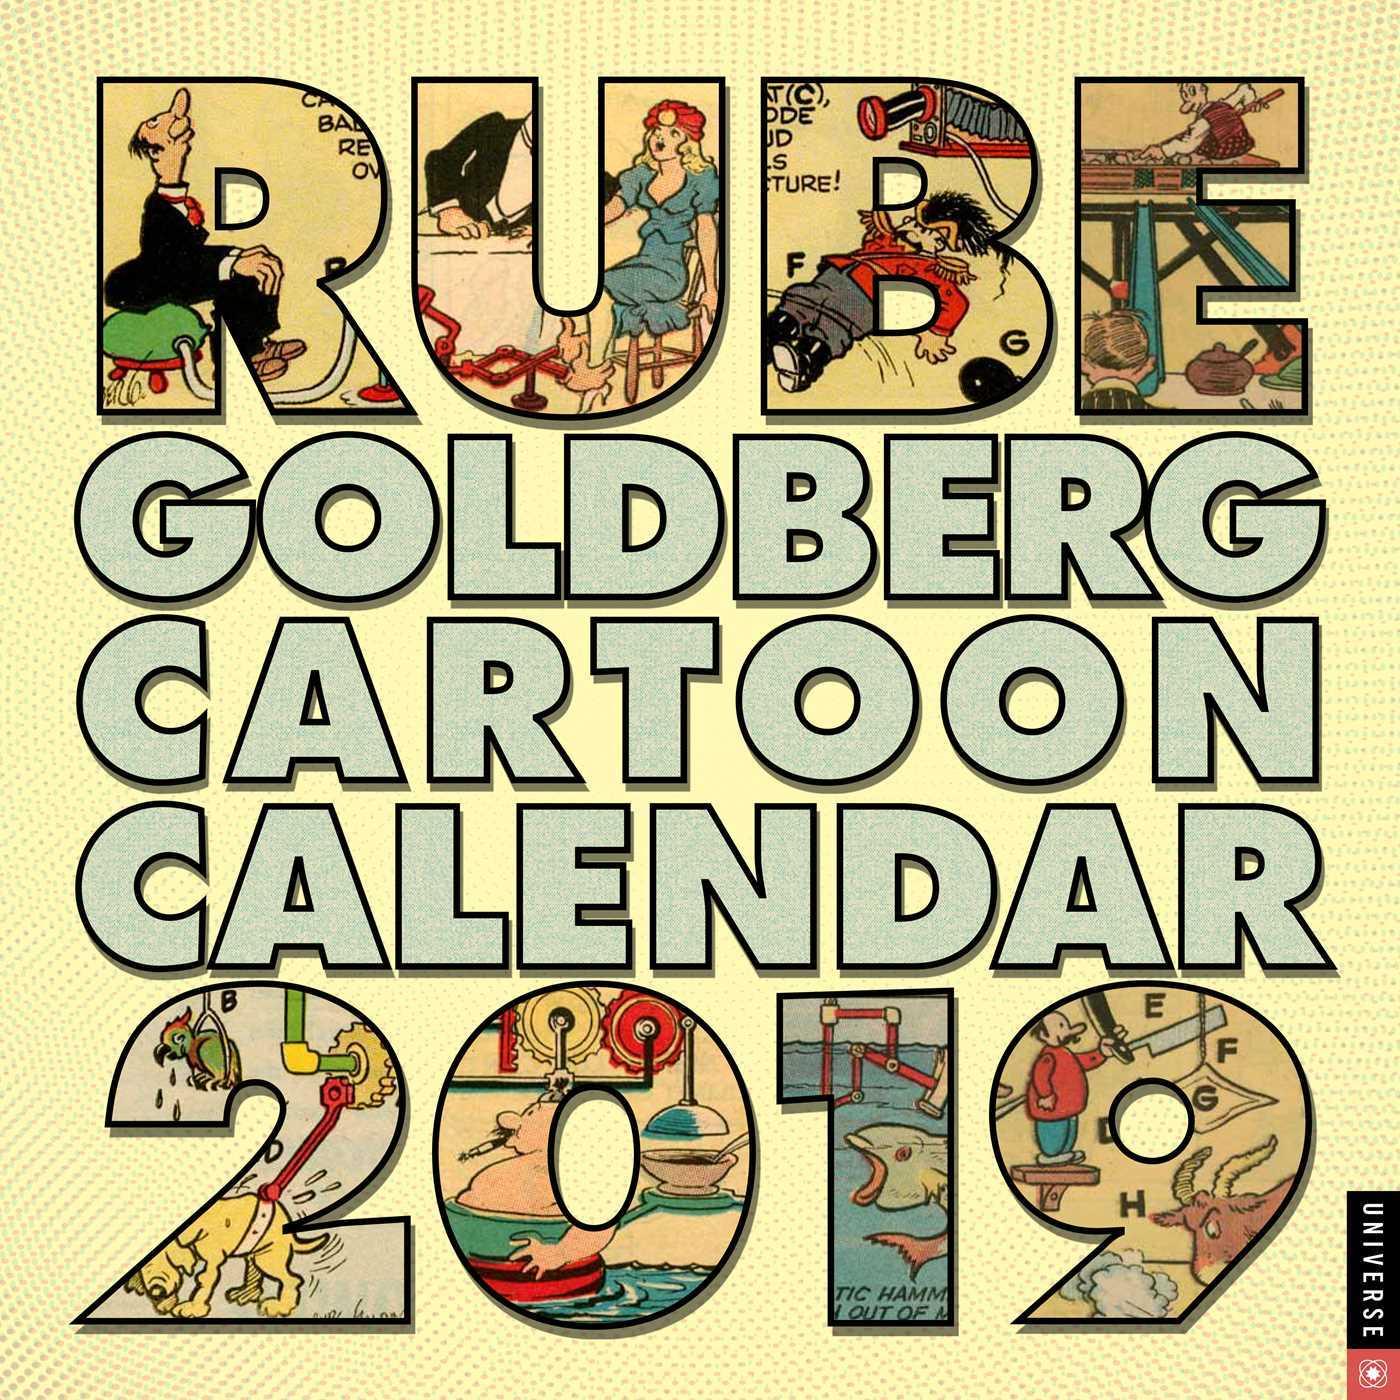 Rube Goldberg 2019 Wall Calendar